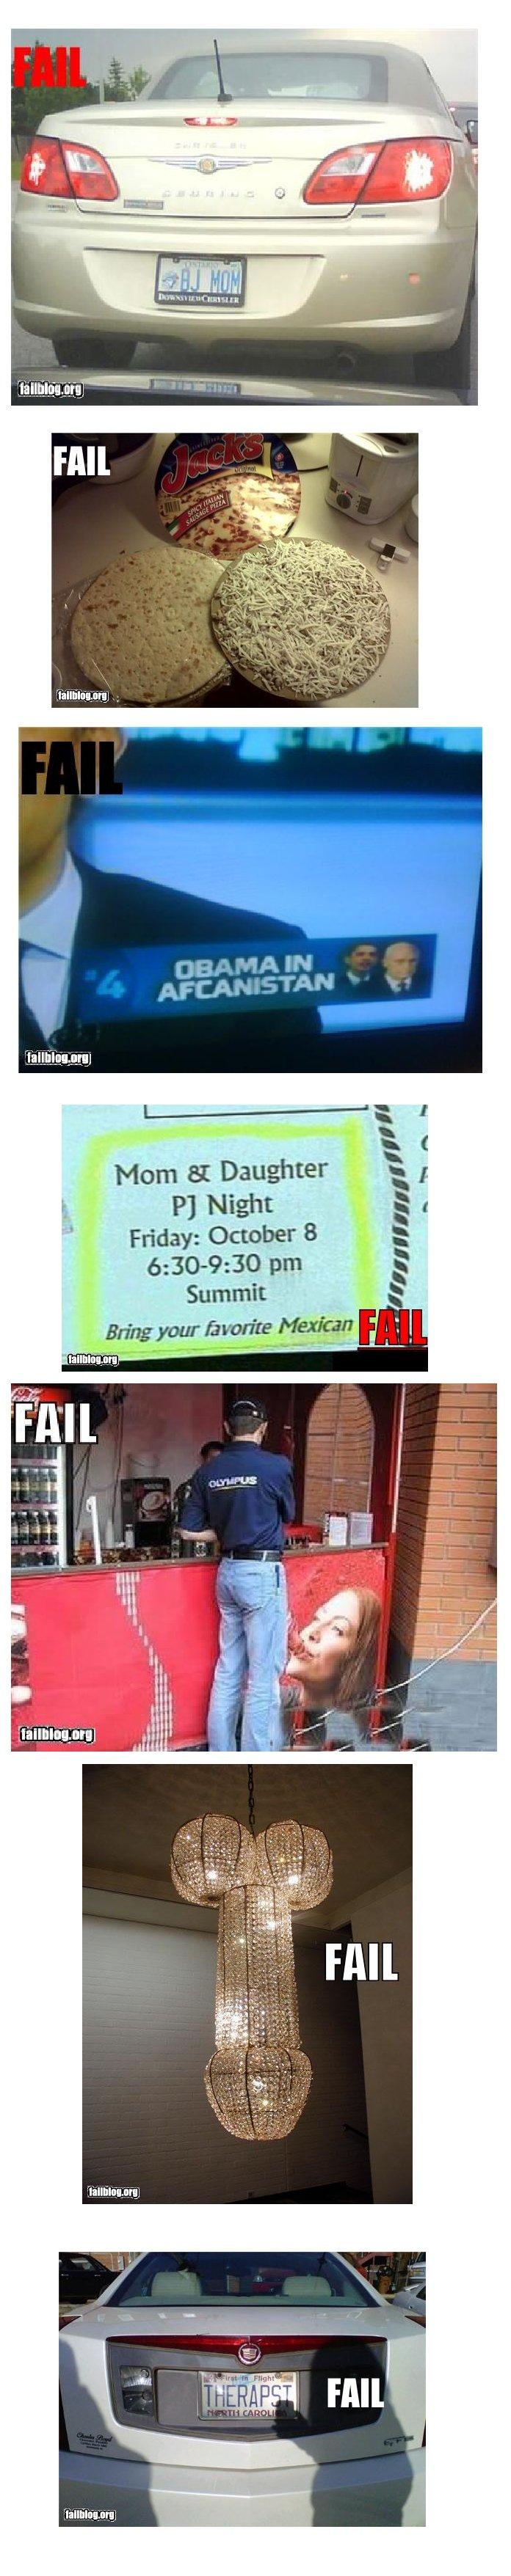 compilation of fail. dfdasfsad. Mom at Daughter P] Night Friday: October [8. REPOST. fail